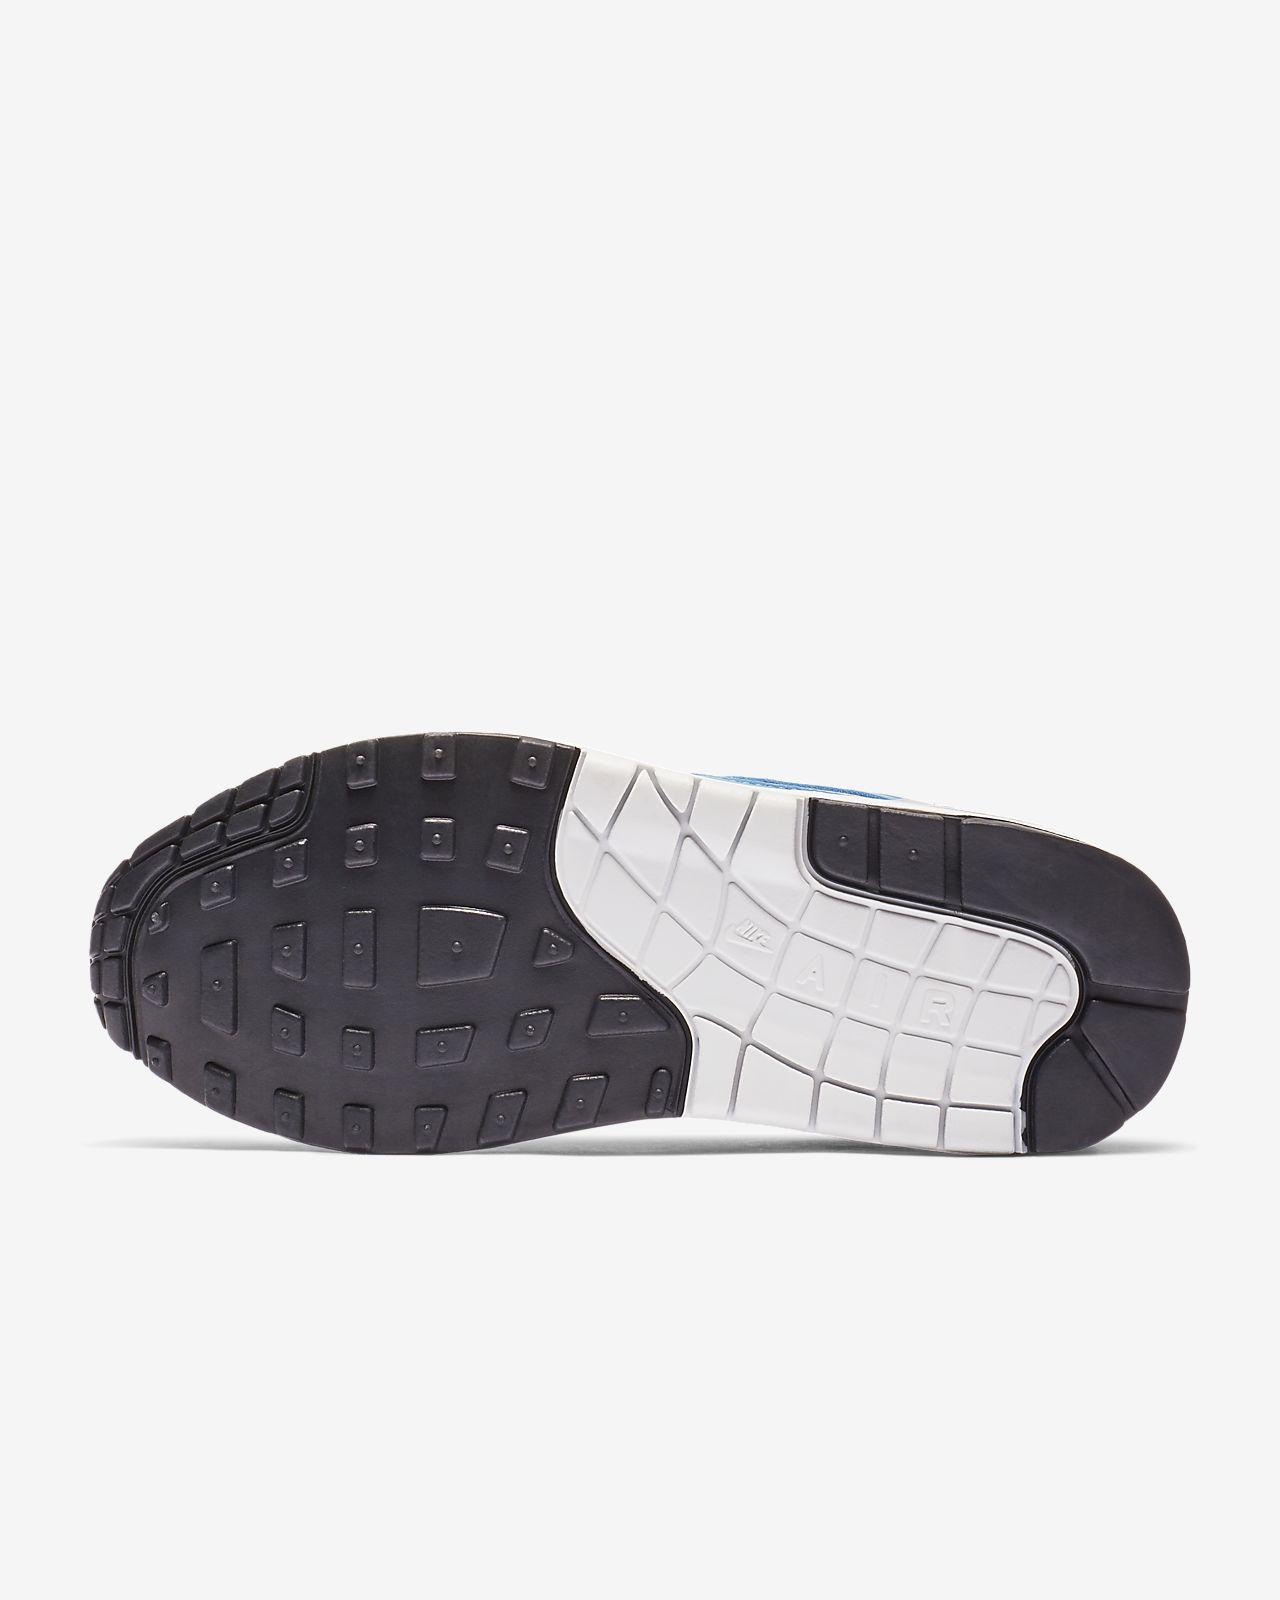 best sneakers 29357 e9a25 ... Sko Nike Air Max 1 Essential för kvinnor